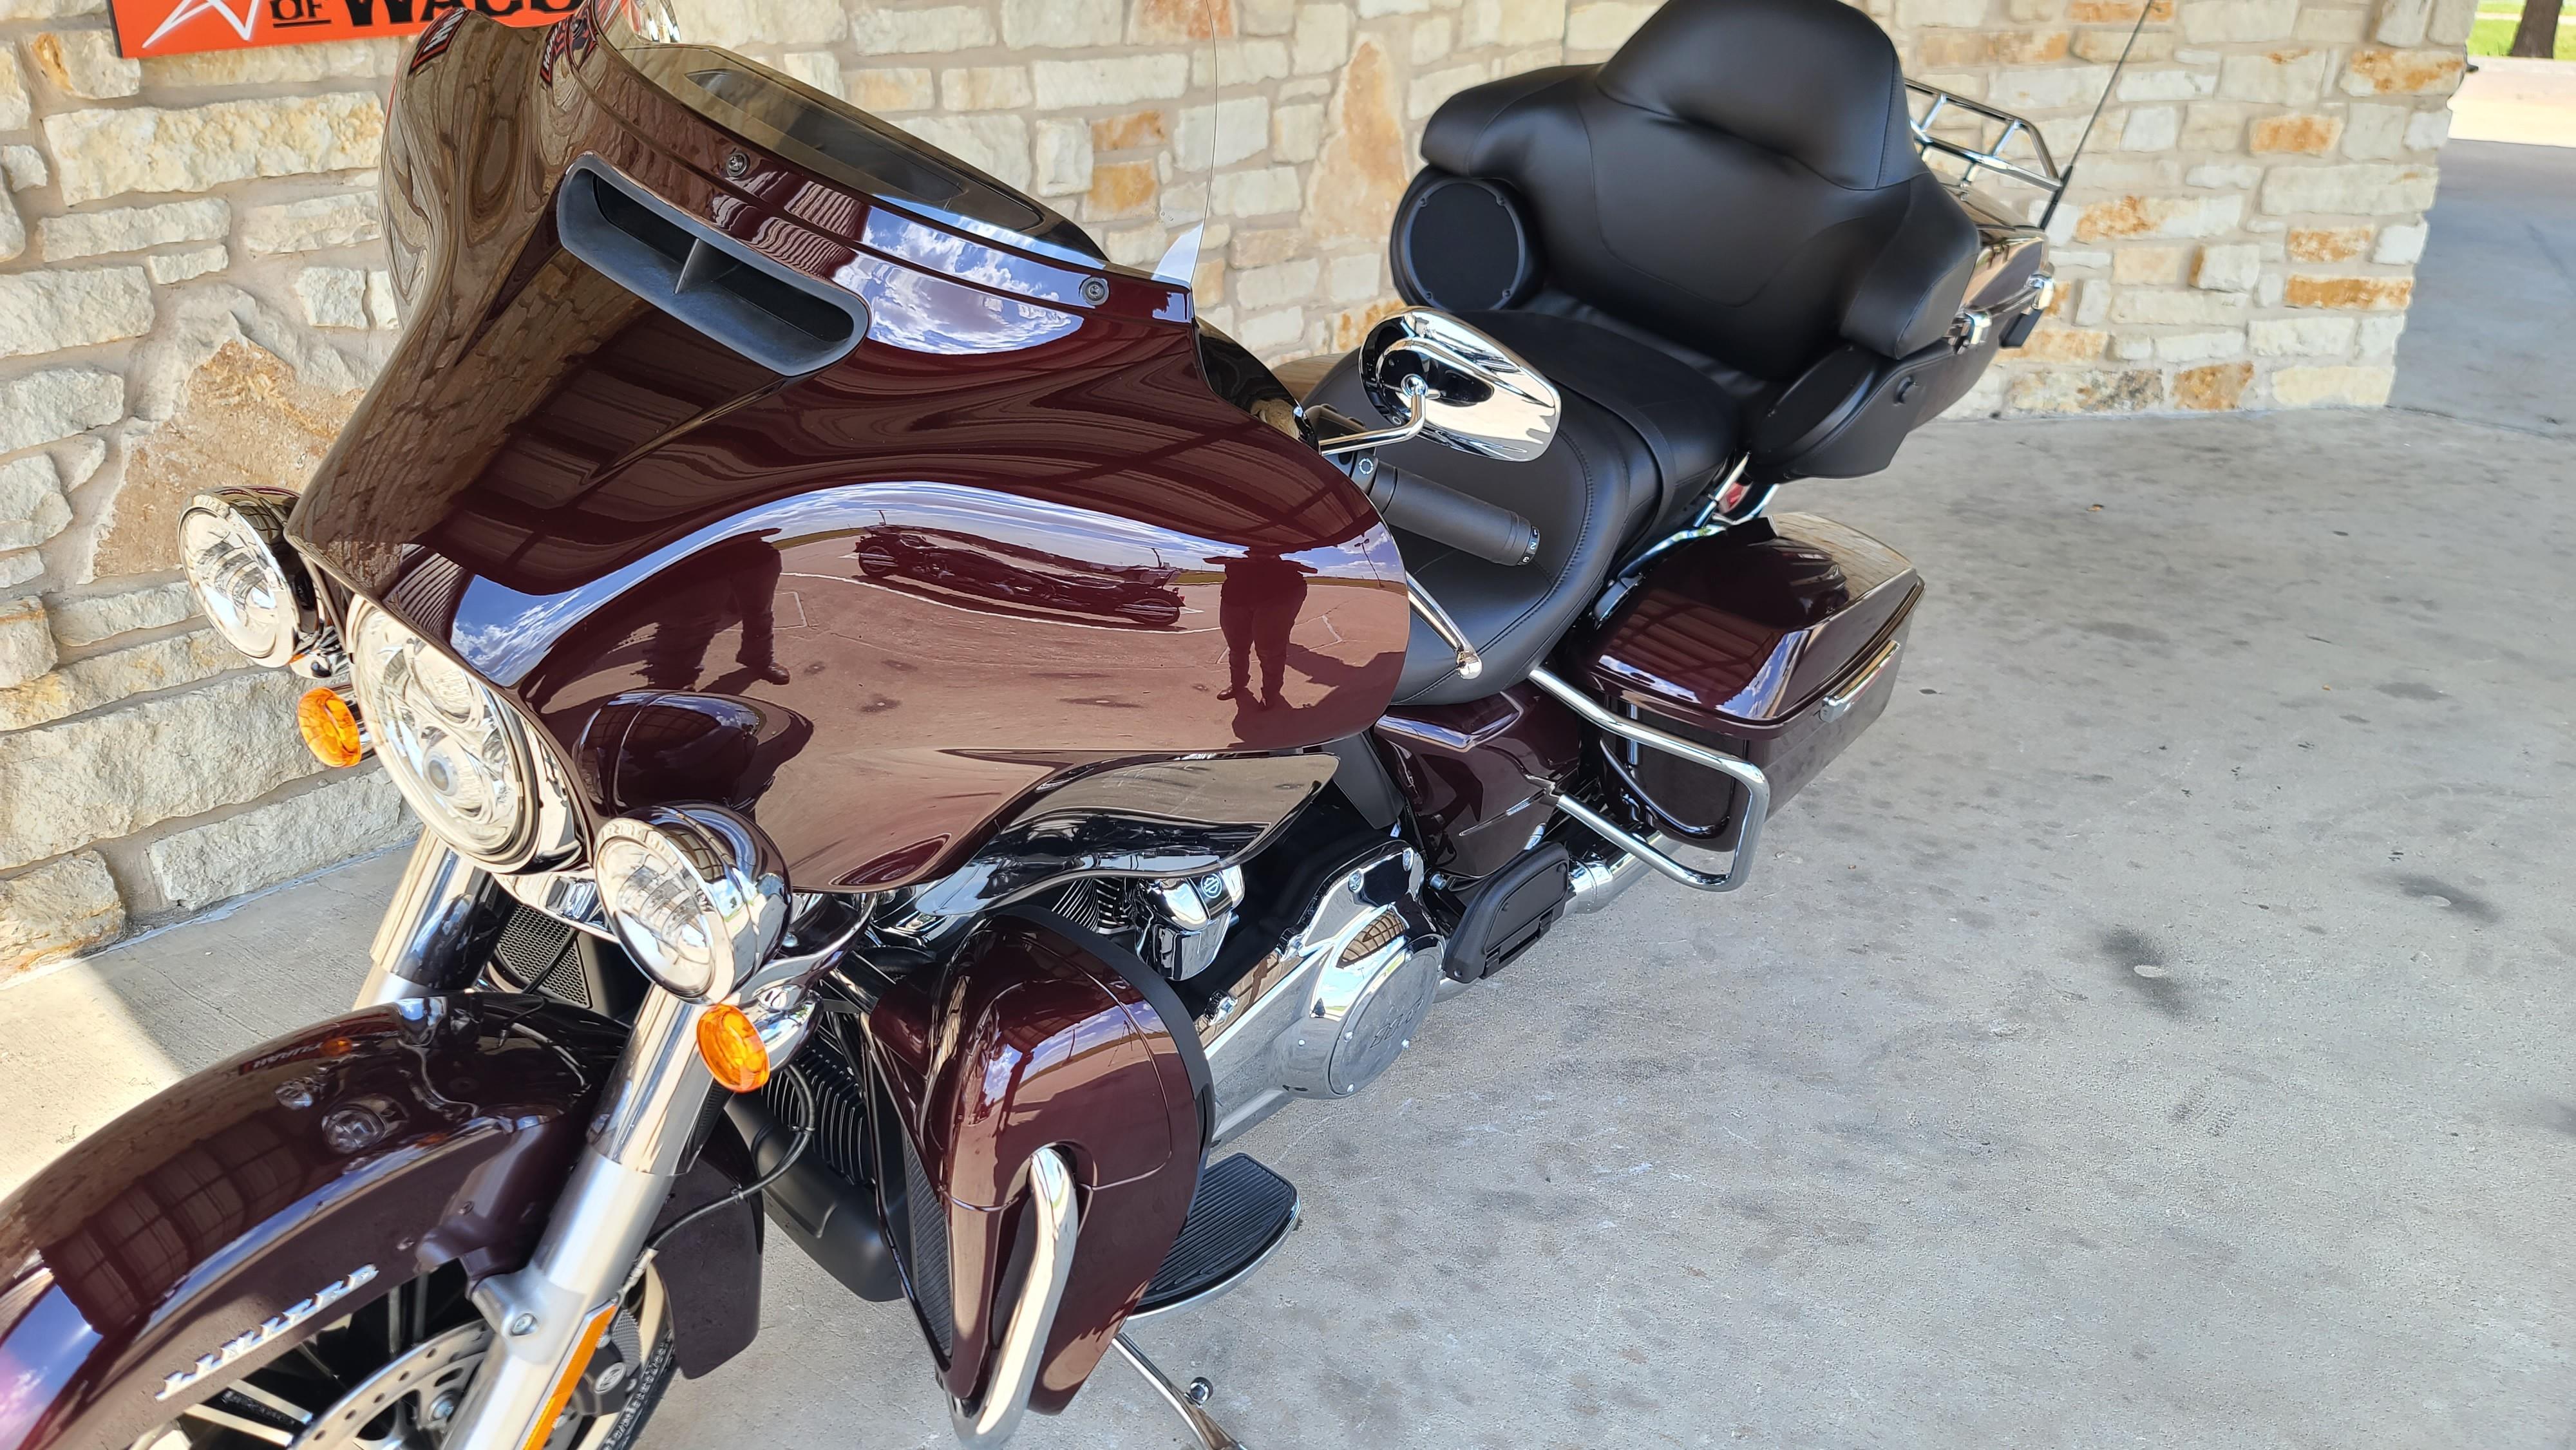 2021 Harley-Davidson Touring FLHTK Ultra Limited at Harley-Davidson of Waco